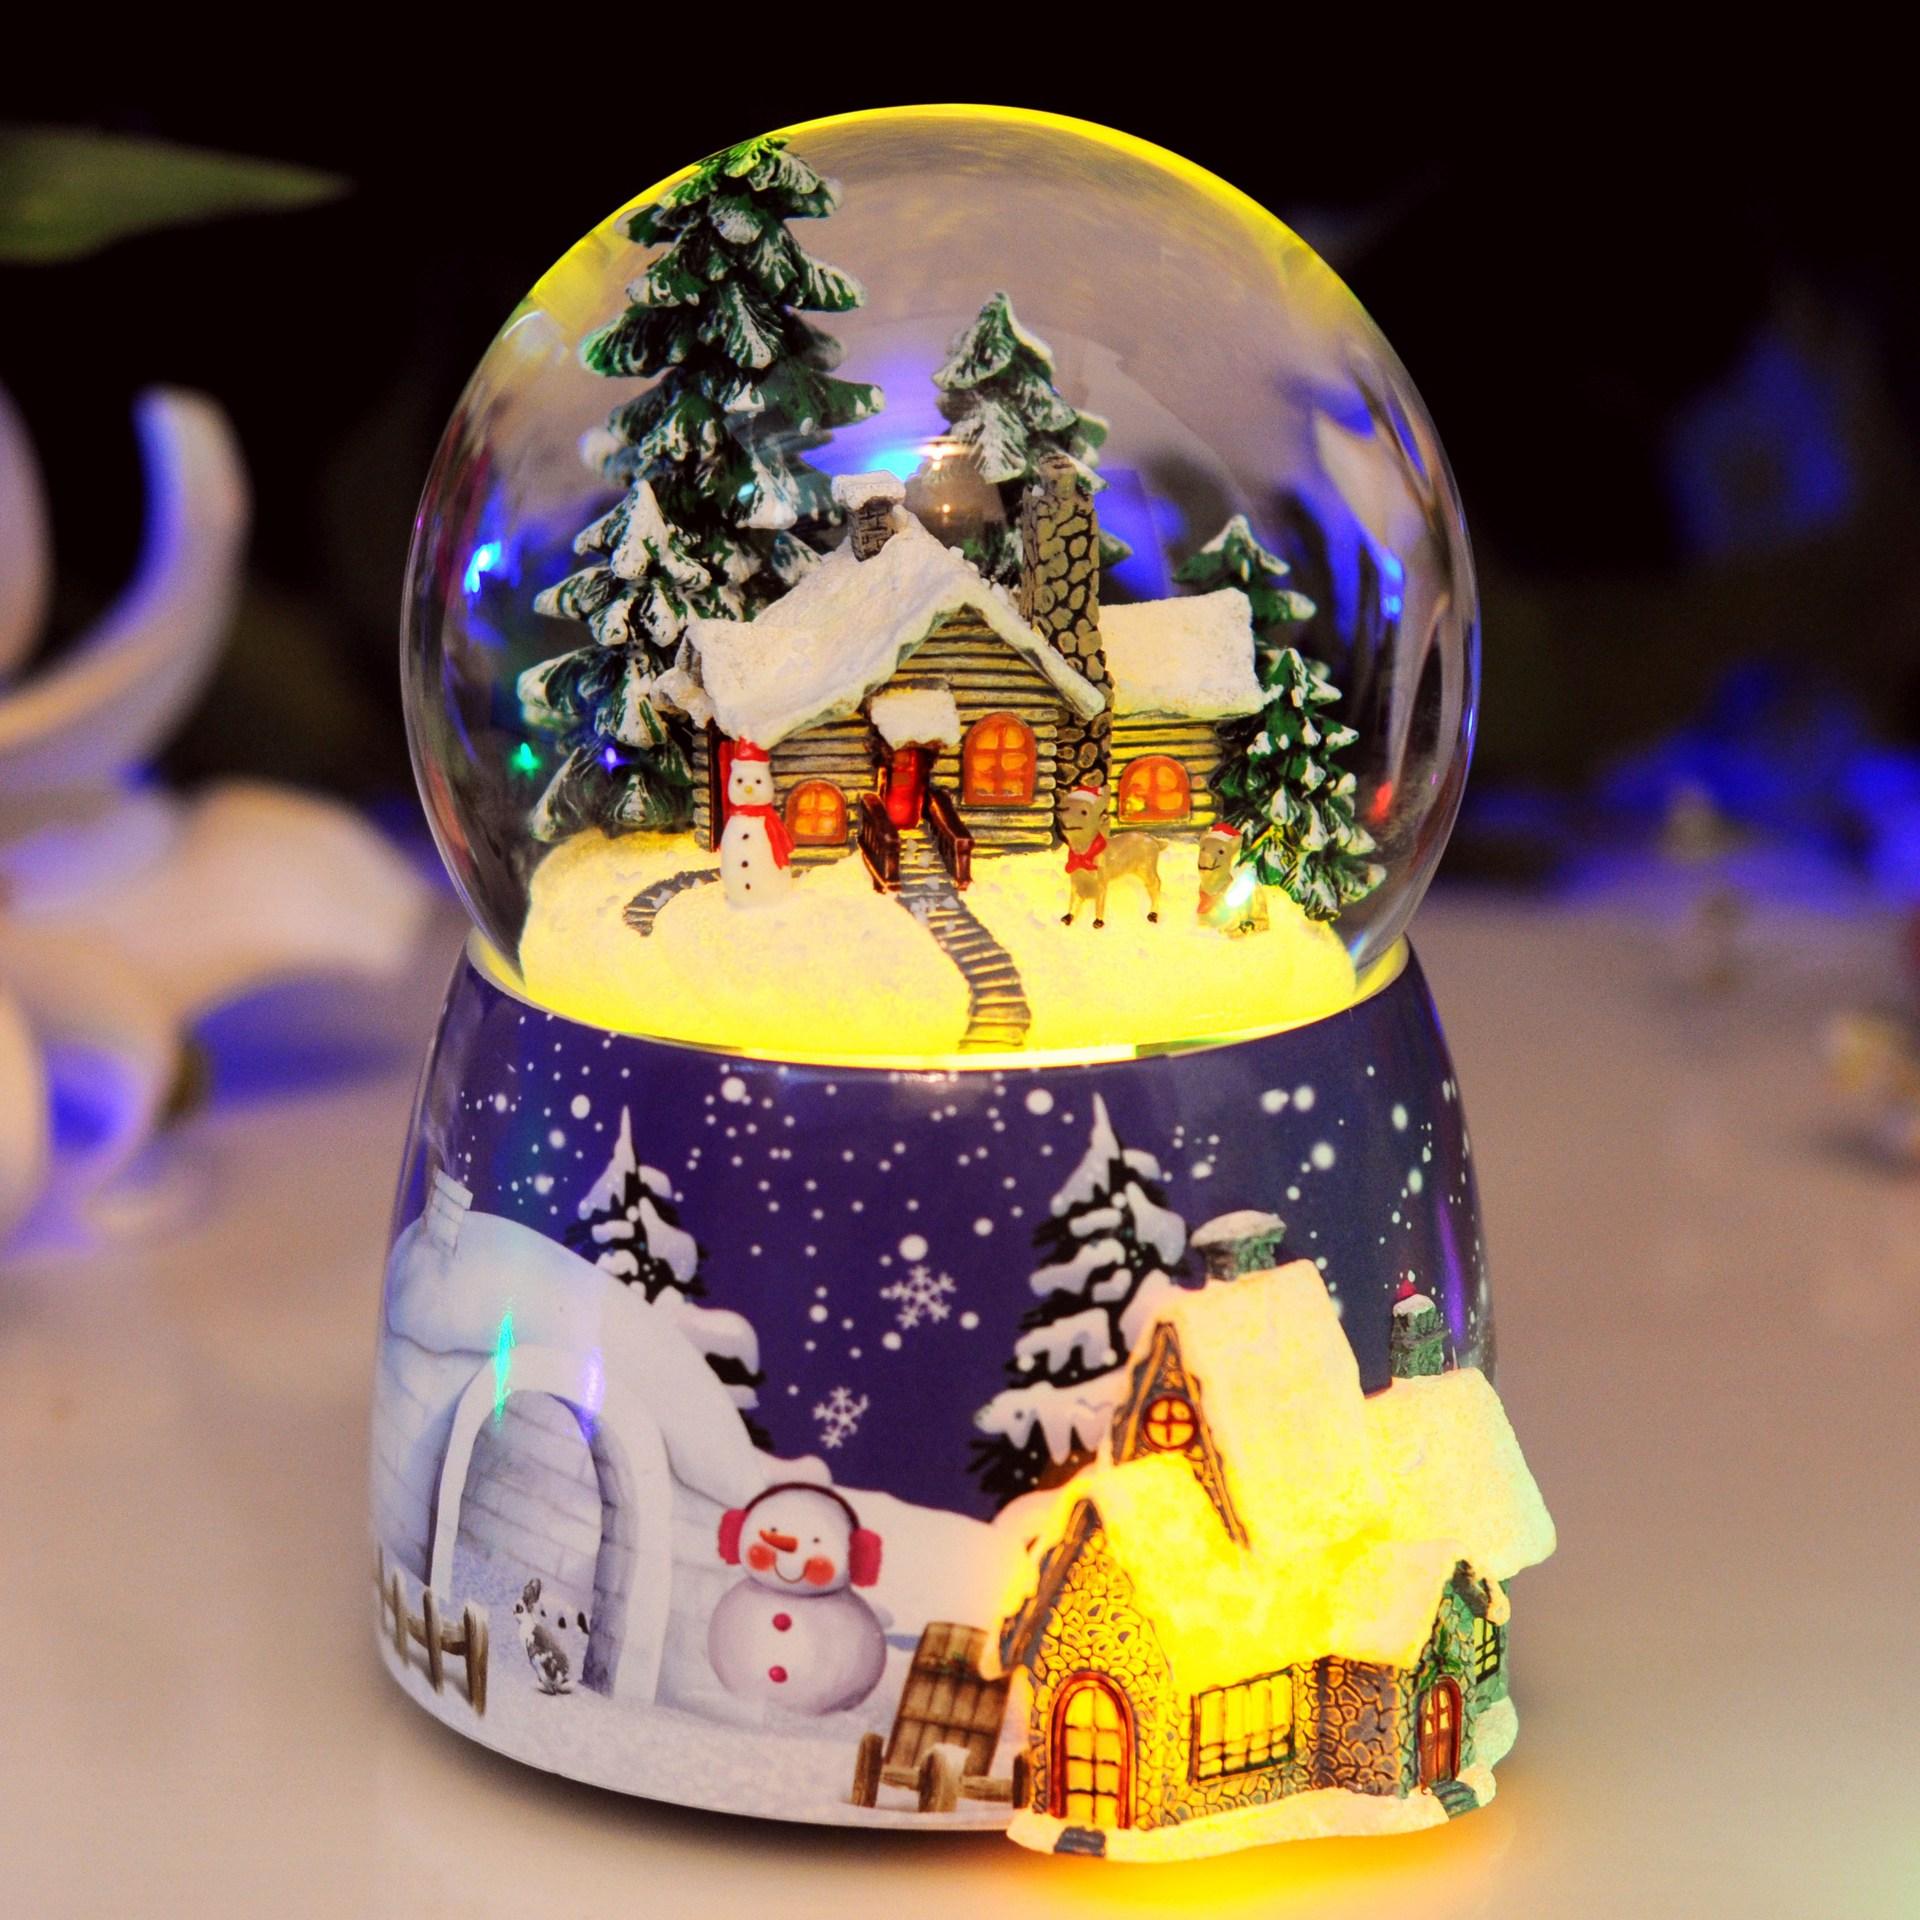 2018 Musical Box Free Shipping Christmas Rotating Light Snow Crystal Ball Music Box Of Male Girl Children For Her Birthday Gift